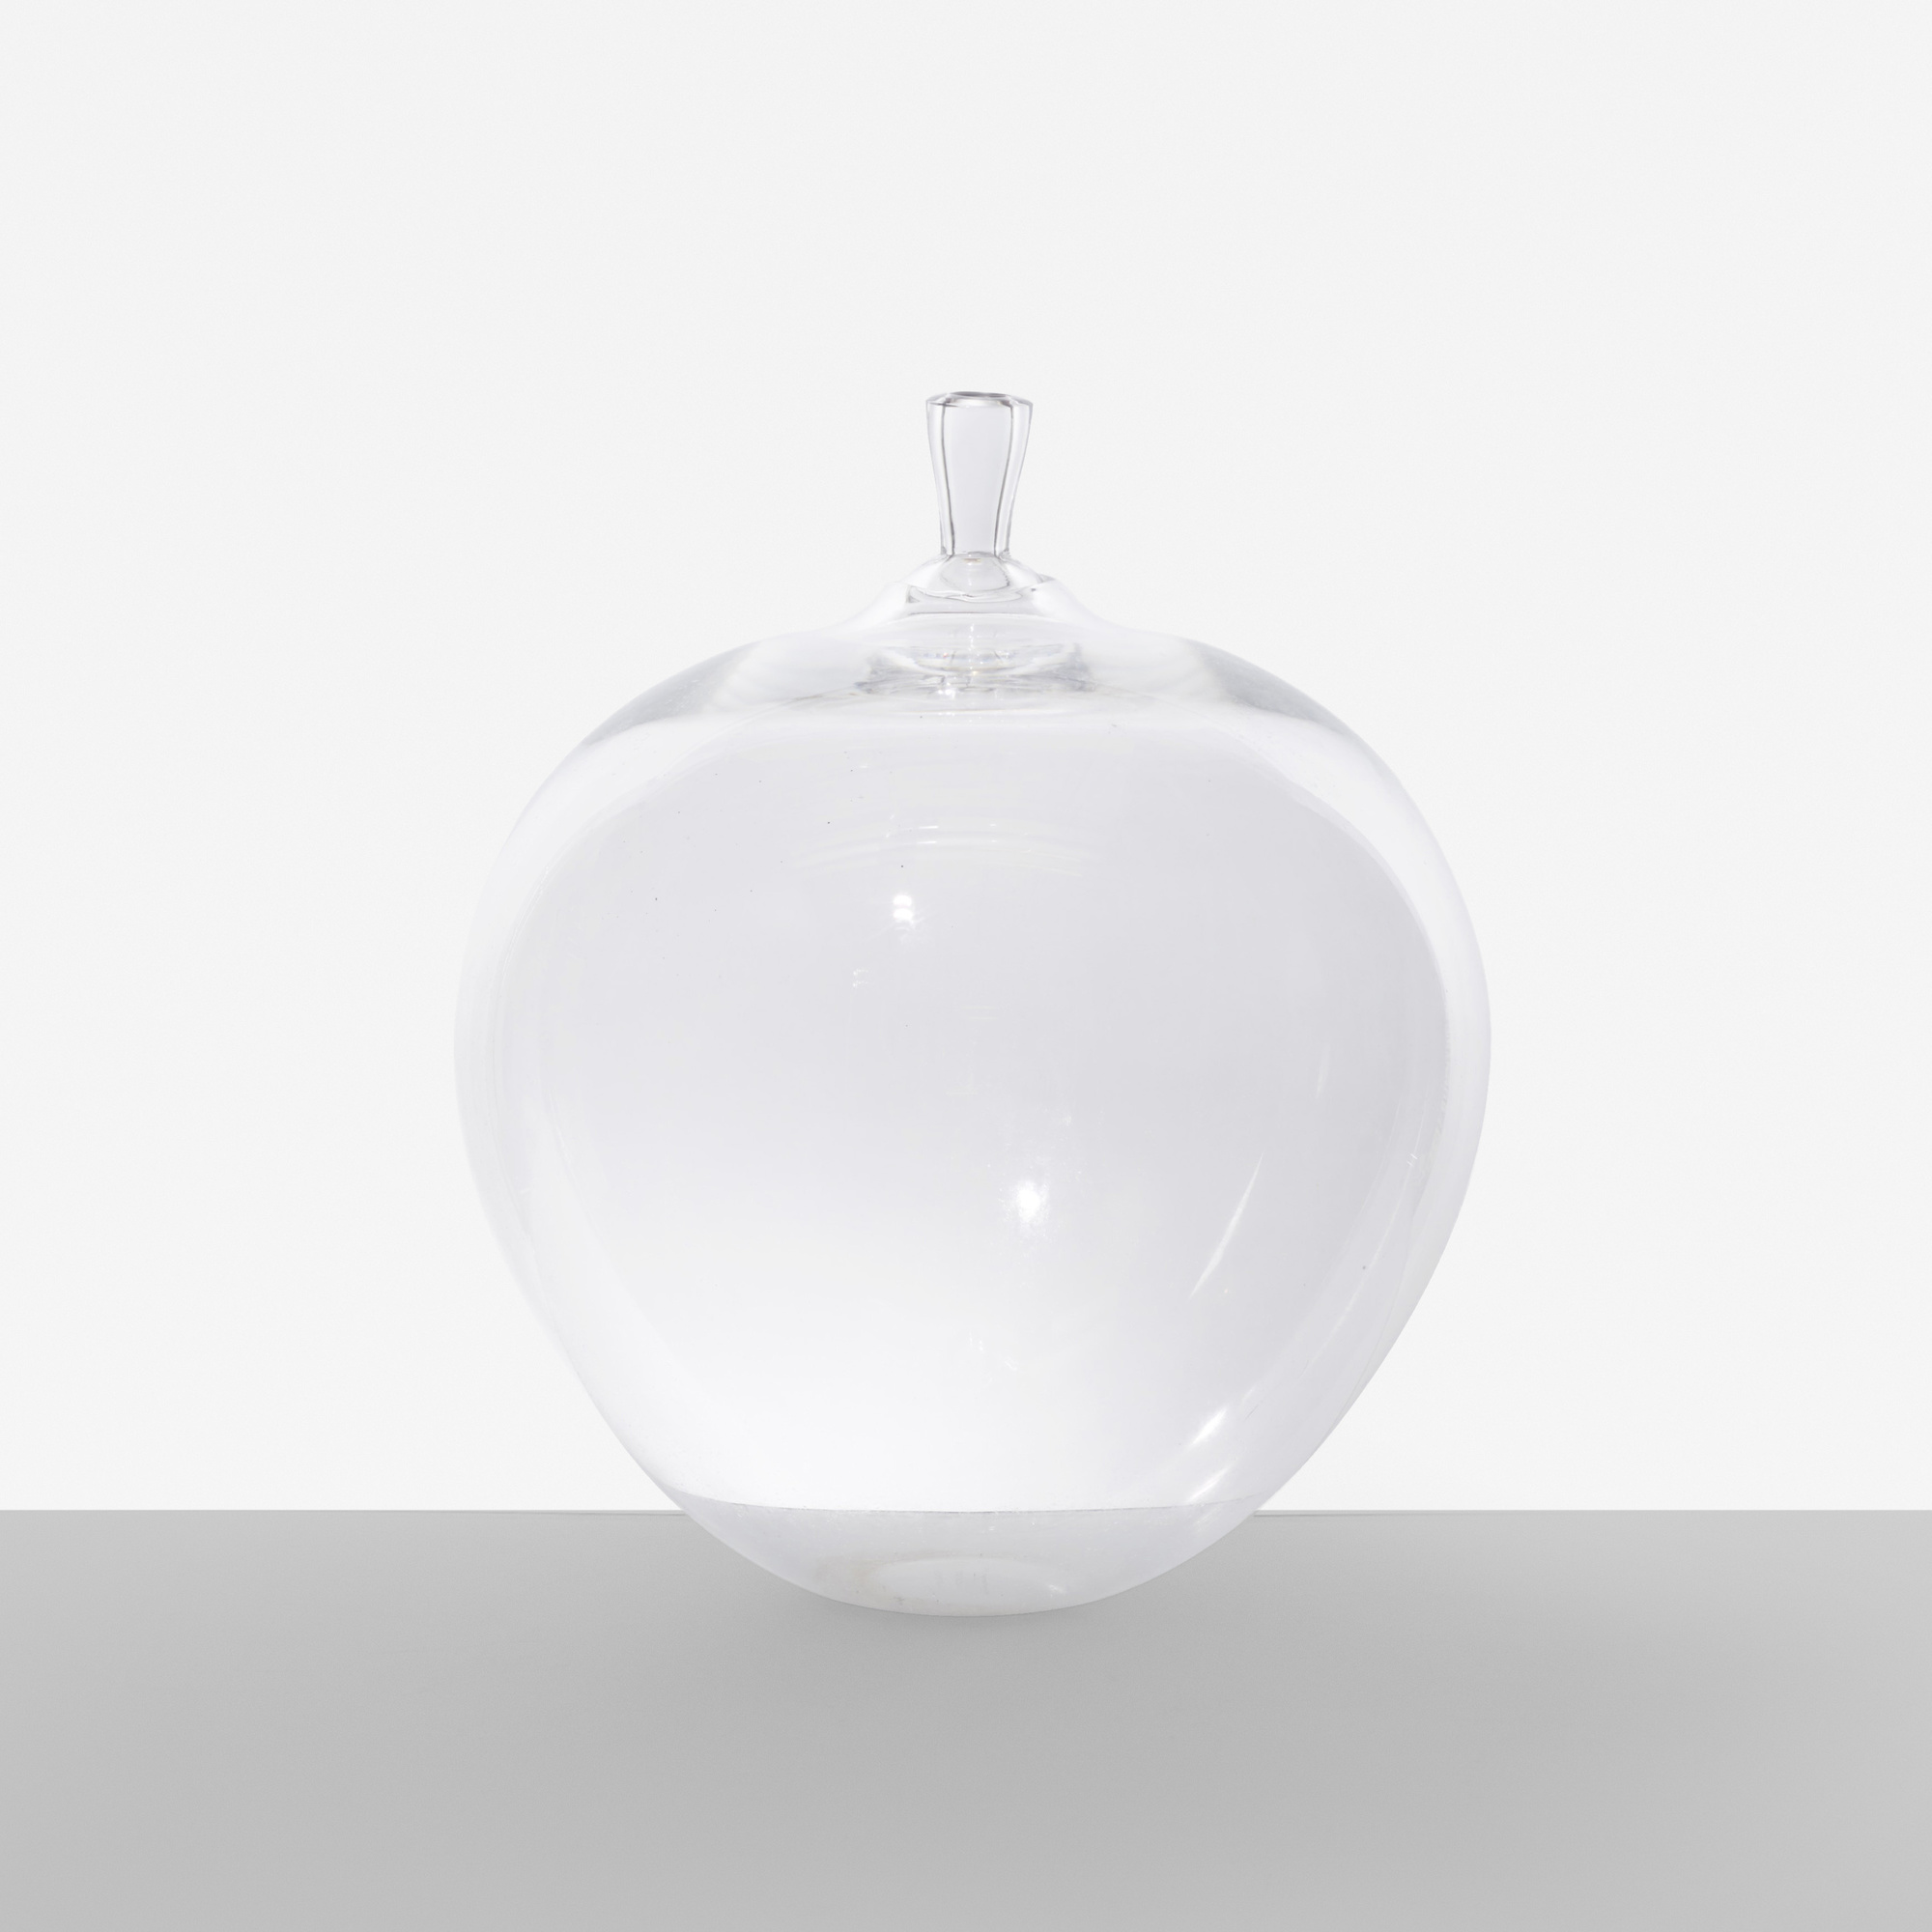 159: Ingeborg Lundin / Apple vase (1 of 2)